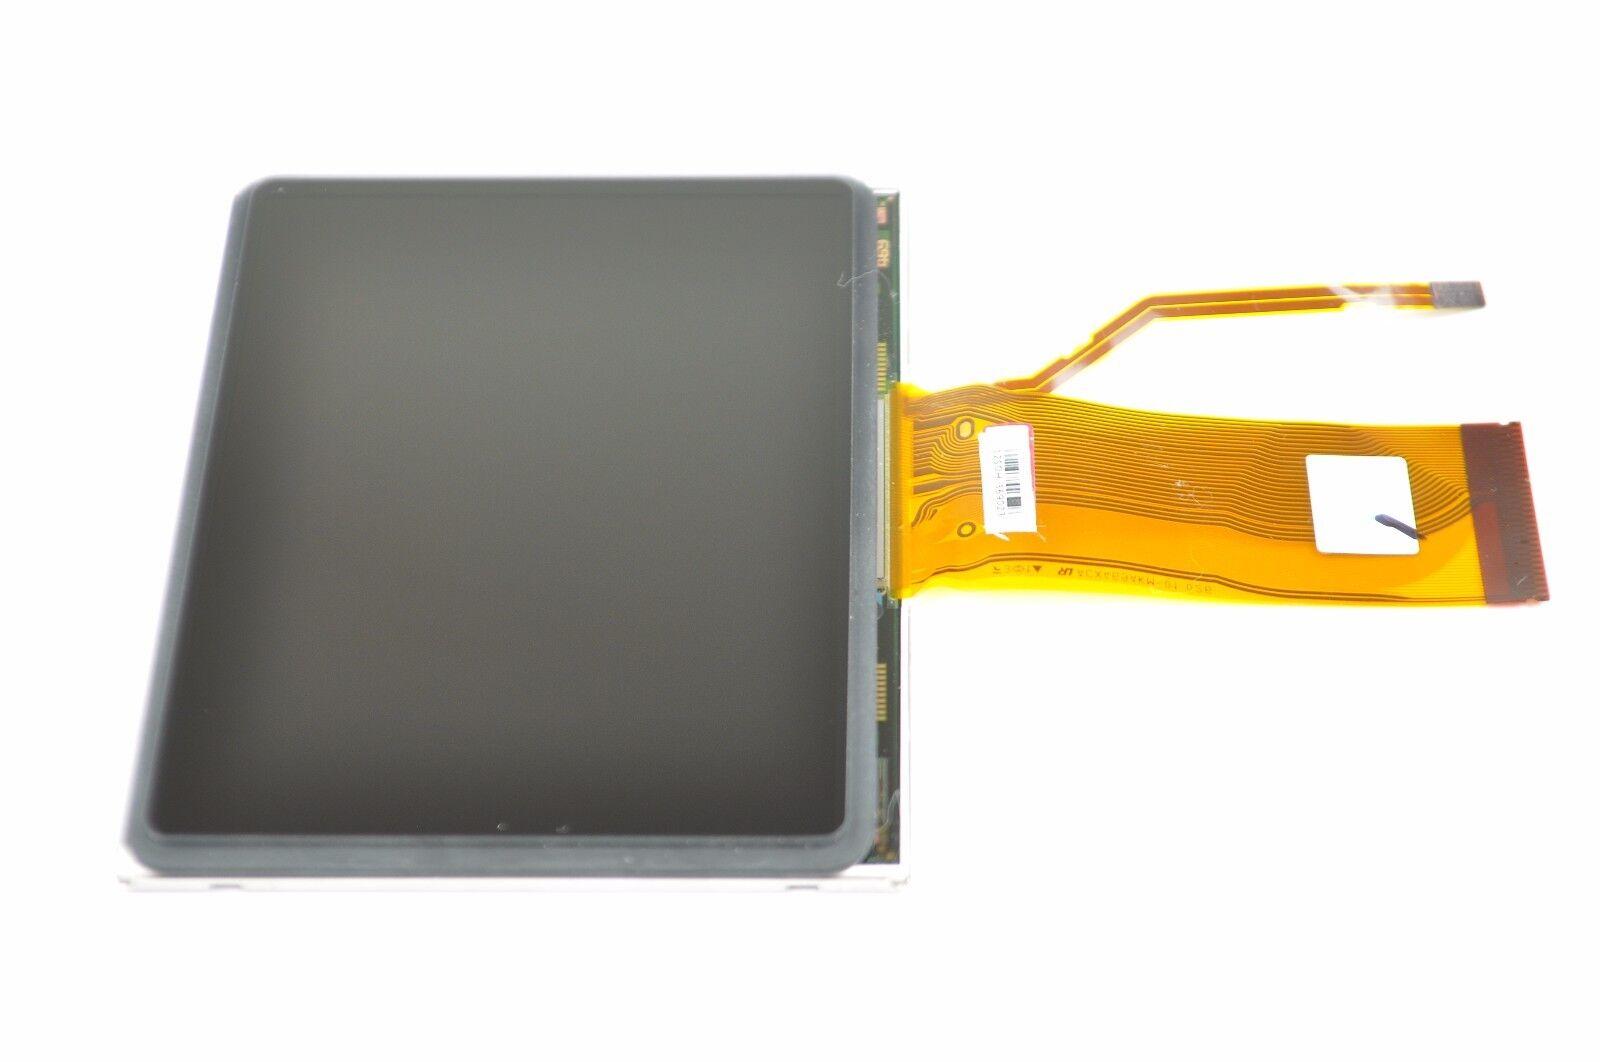 Nikon D7200 D810 D750 Slr Replacement Lcd Display Screen ...